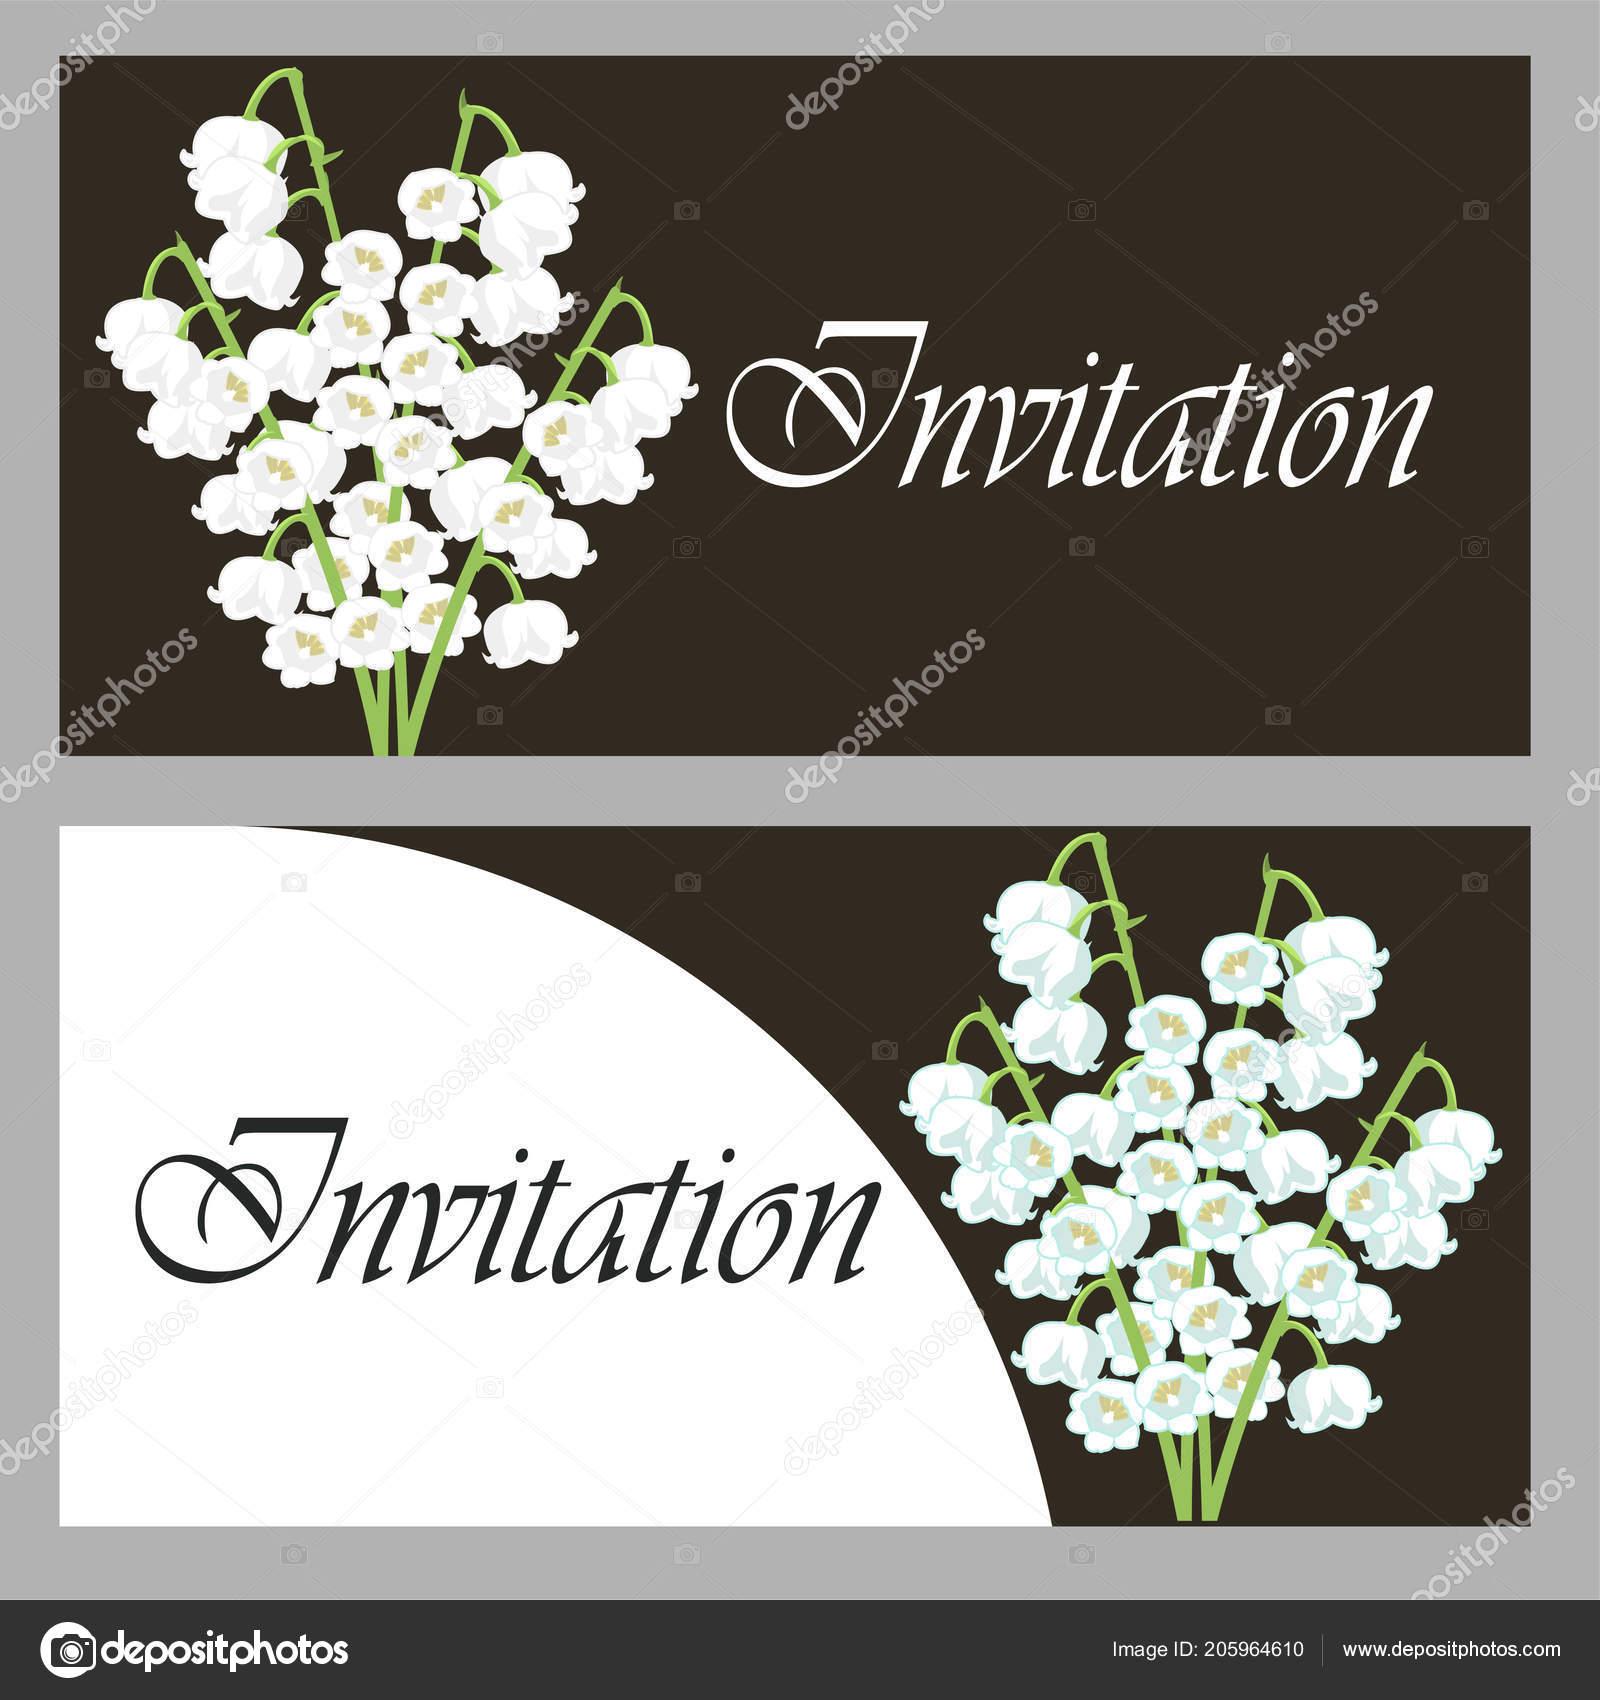 Vector graphics colorful invitation card vetor de stock vector graphics colorful invitation card vetor de stock stopboris Gallery